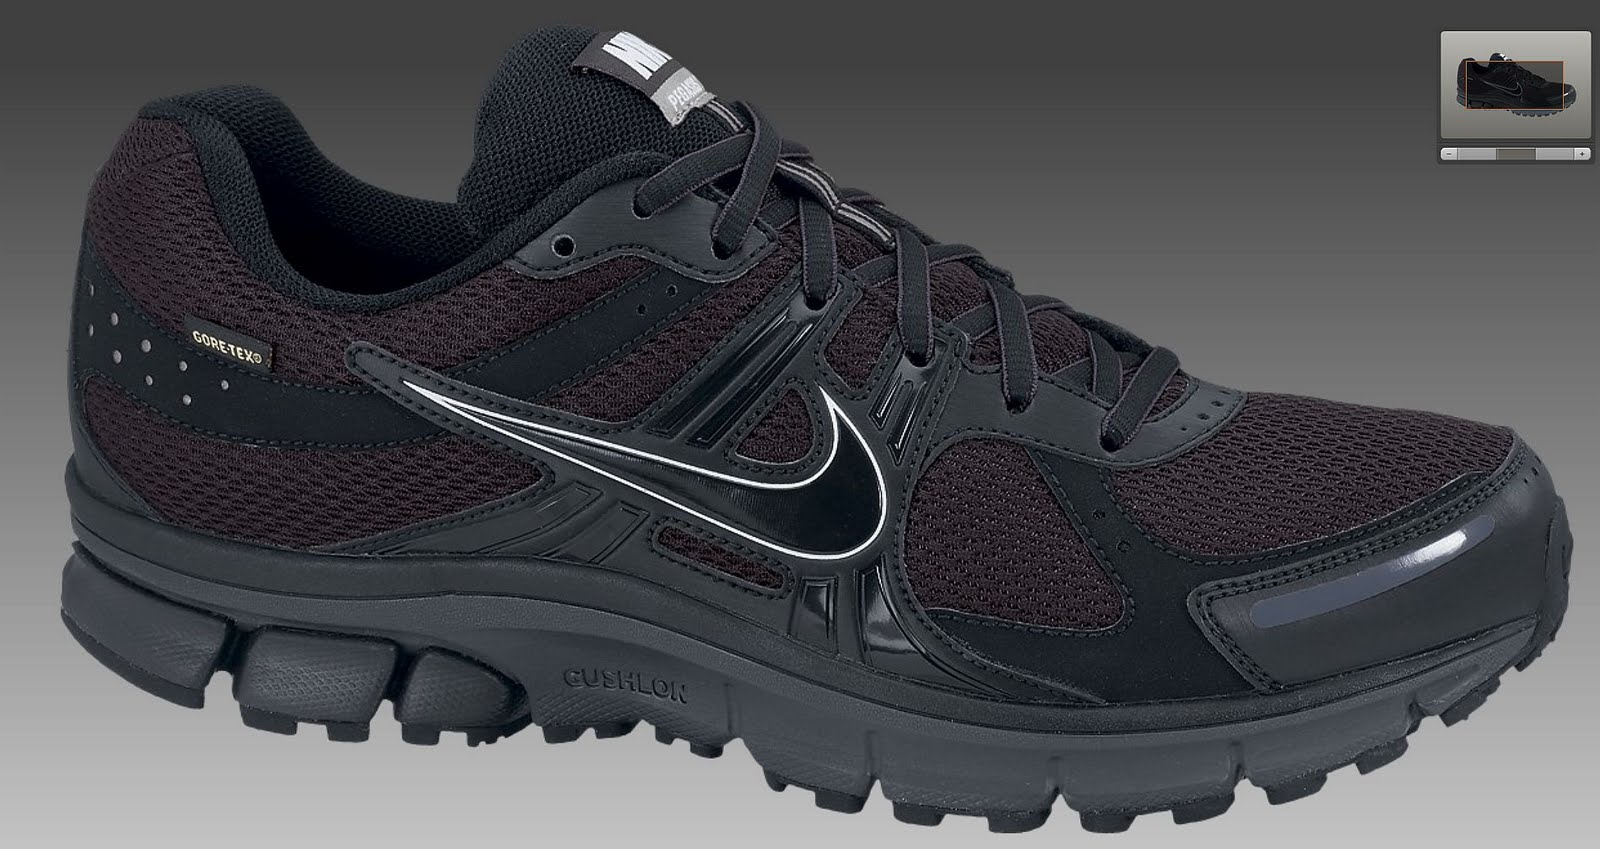 68cc508917b3 low price nike air pegasus 25 gore tex trail running shoes 00939 61187   wholesale my stuff nike air pegasus27 gtx 0b944 0071f